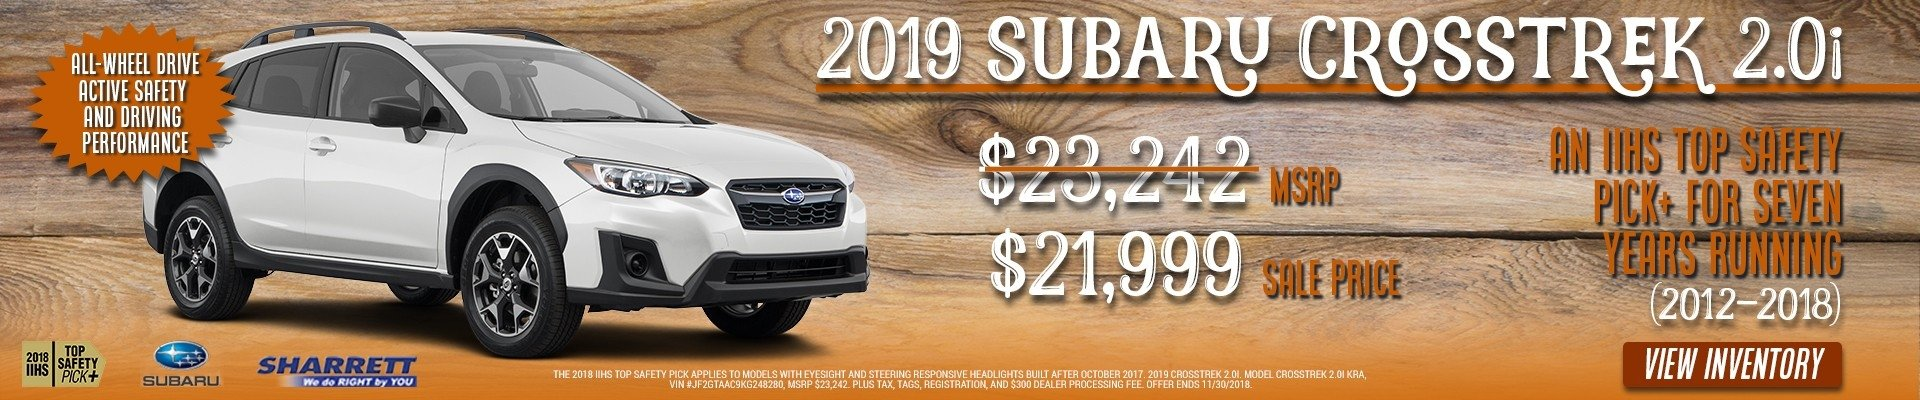 Get a 2019 Subaru Crosstrek 2.0i for $21,999 at Sharrett Subaru of Hagerstown, MD